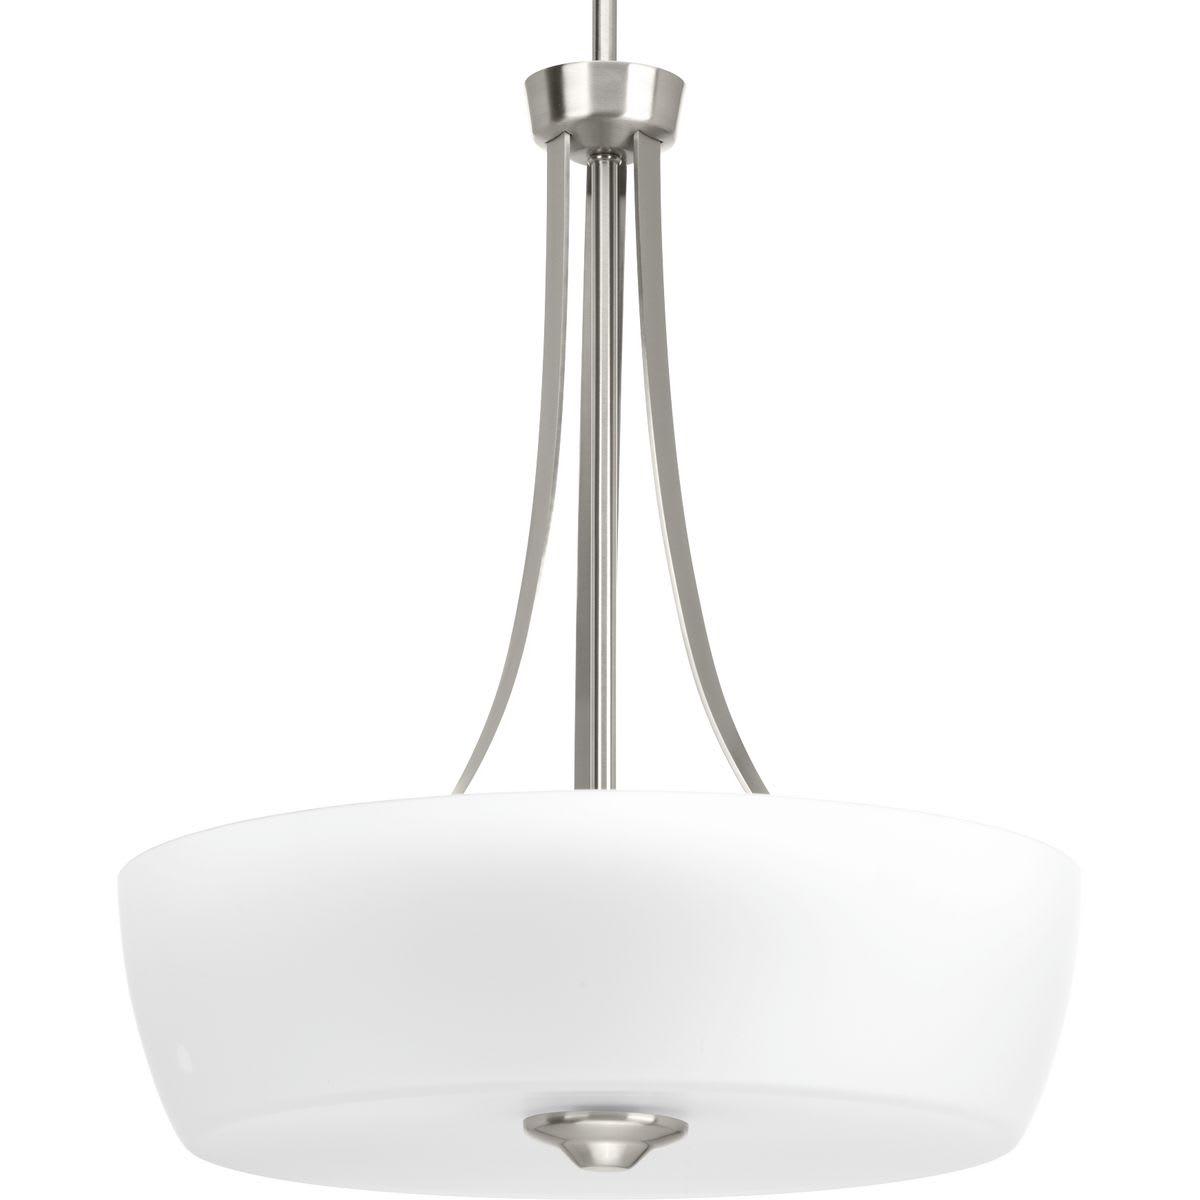 Progress Lighting Leap Collection 3-Light Brushed Nickel Bath Light P300133-009